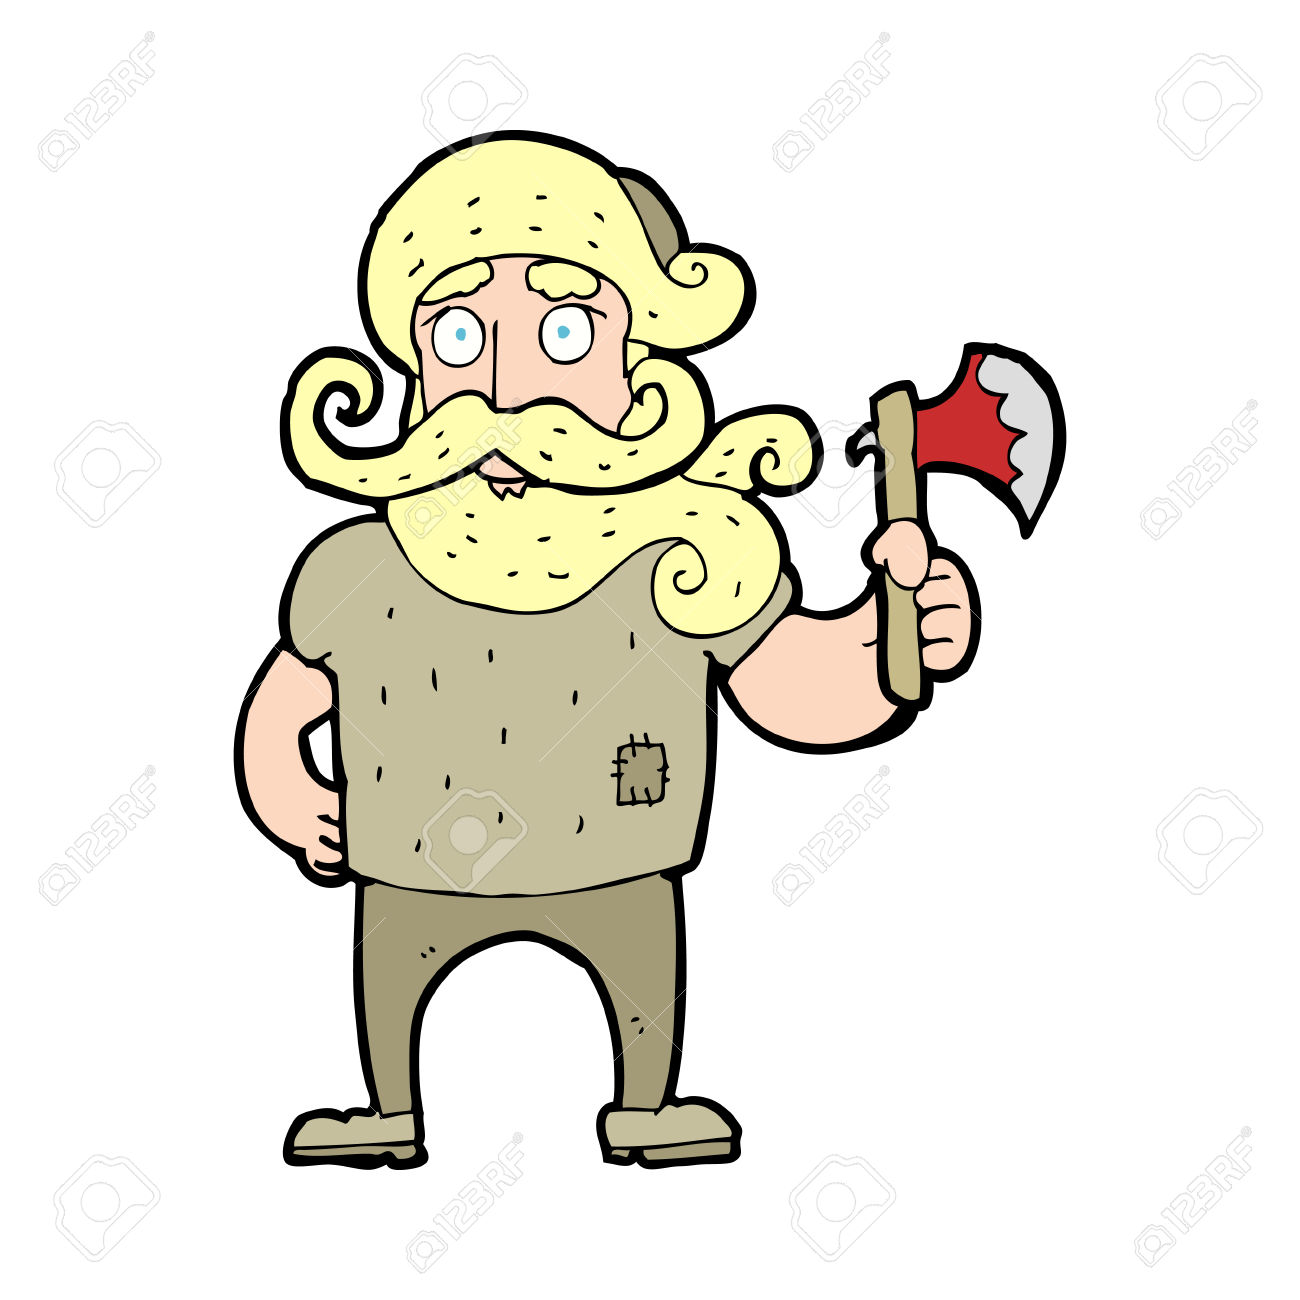 Cartoon Lumberjack With Axe Royalty Free Cliparts, Vectors, And.